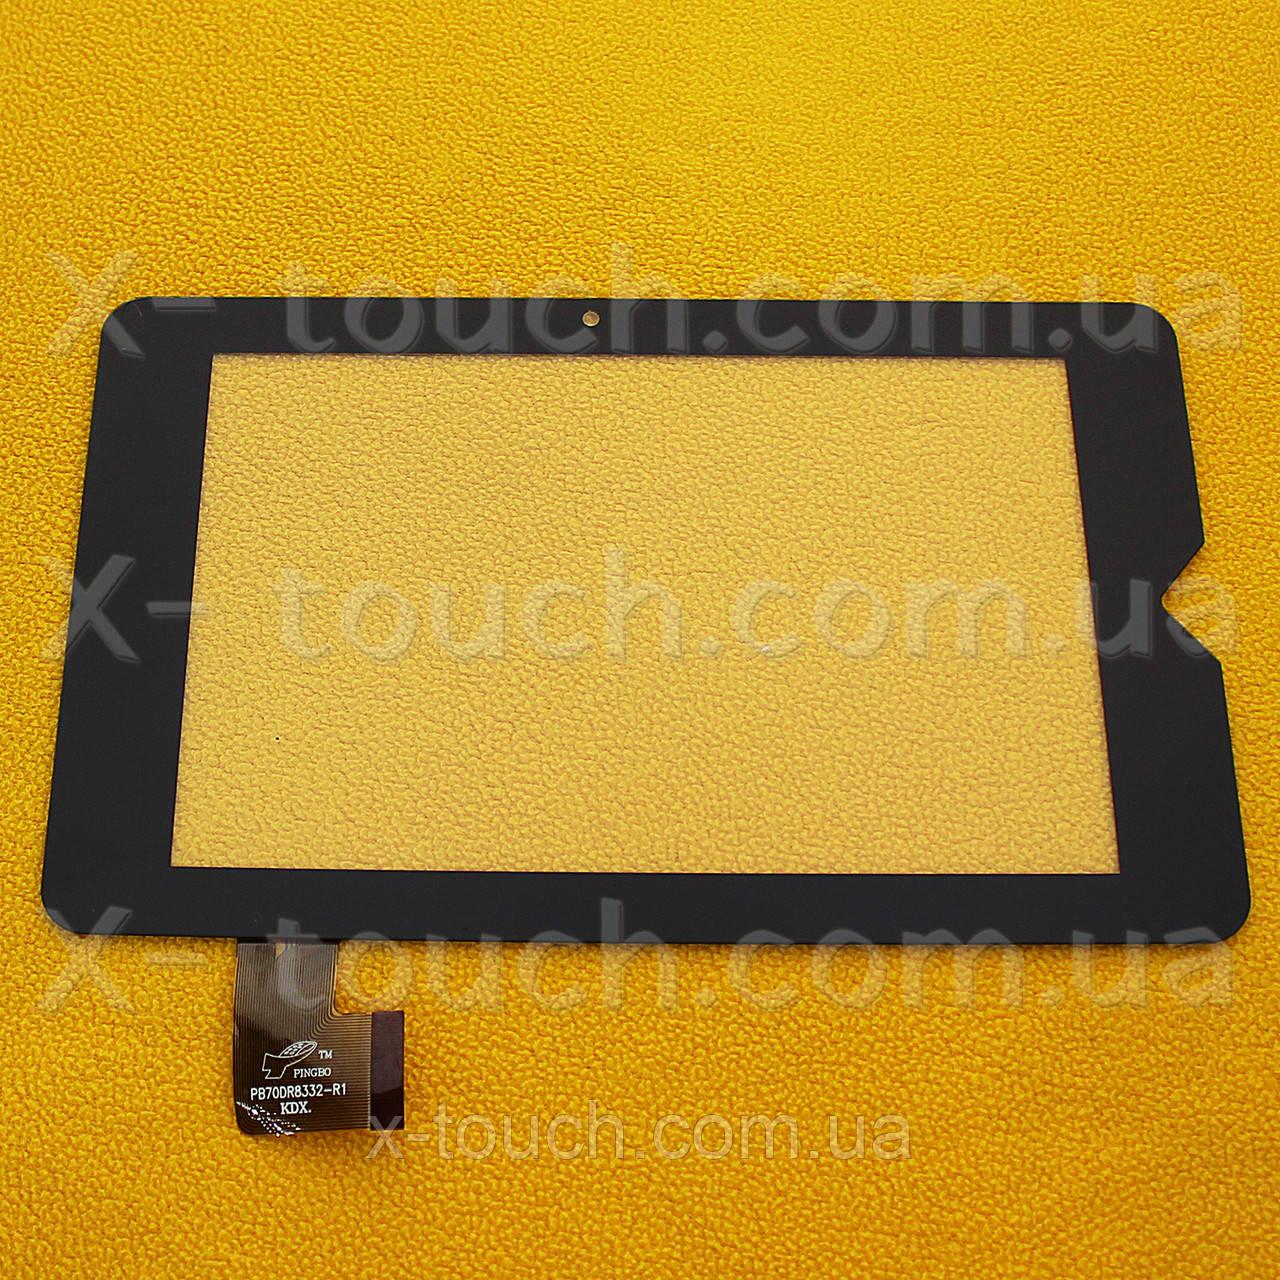 Тачскрин, сенсор PB70DR8071 для планшета